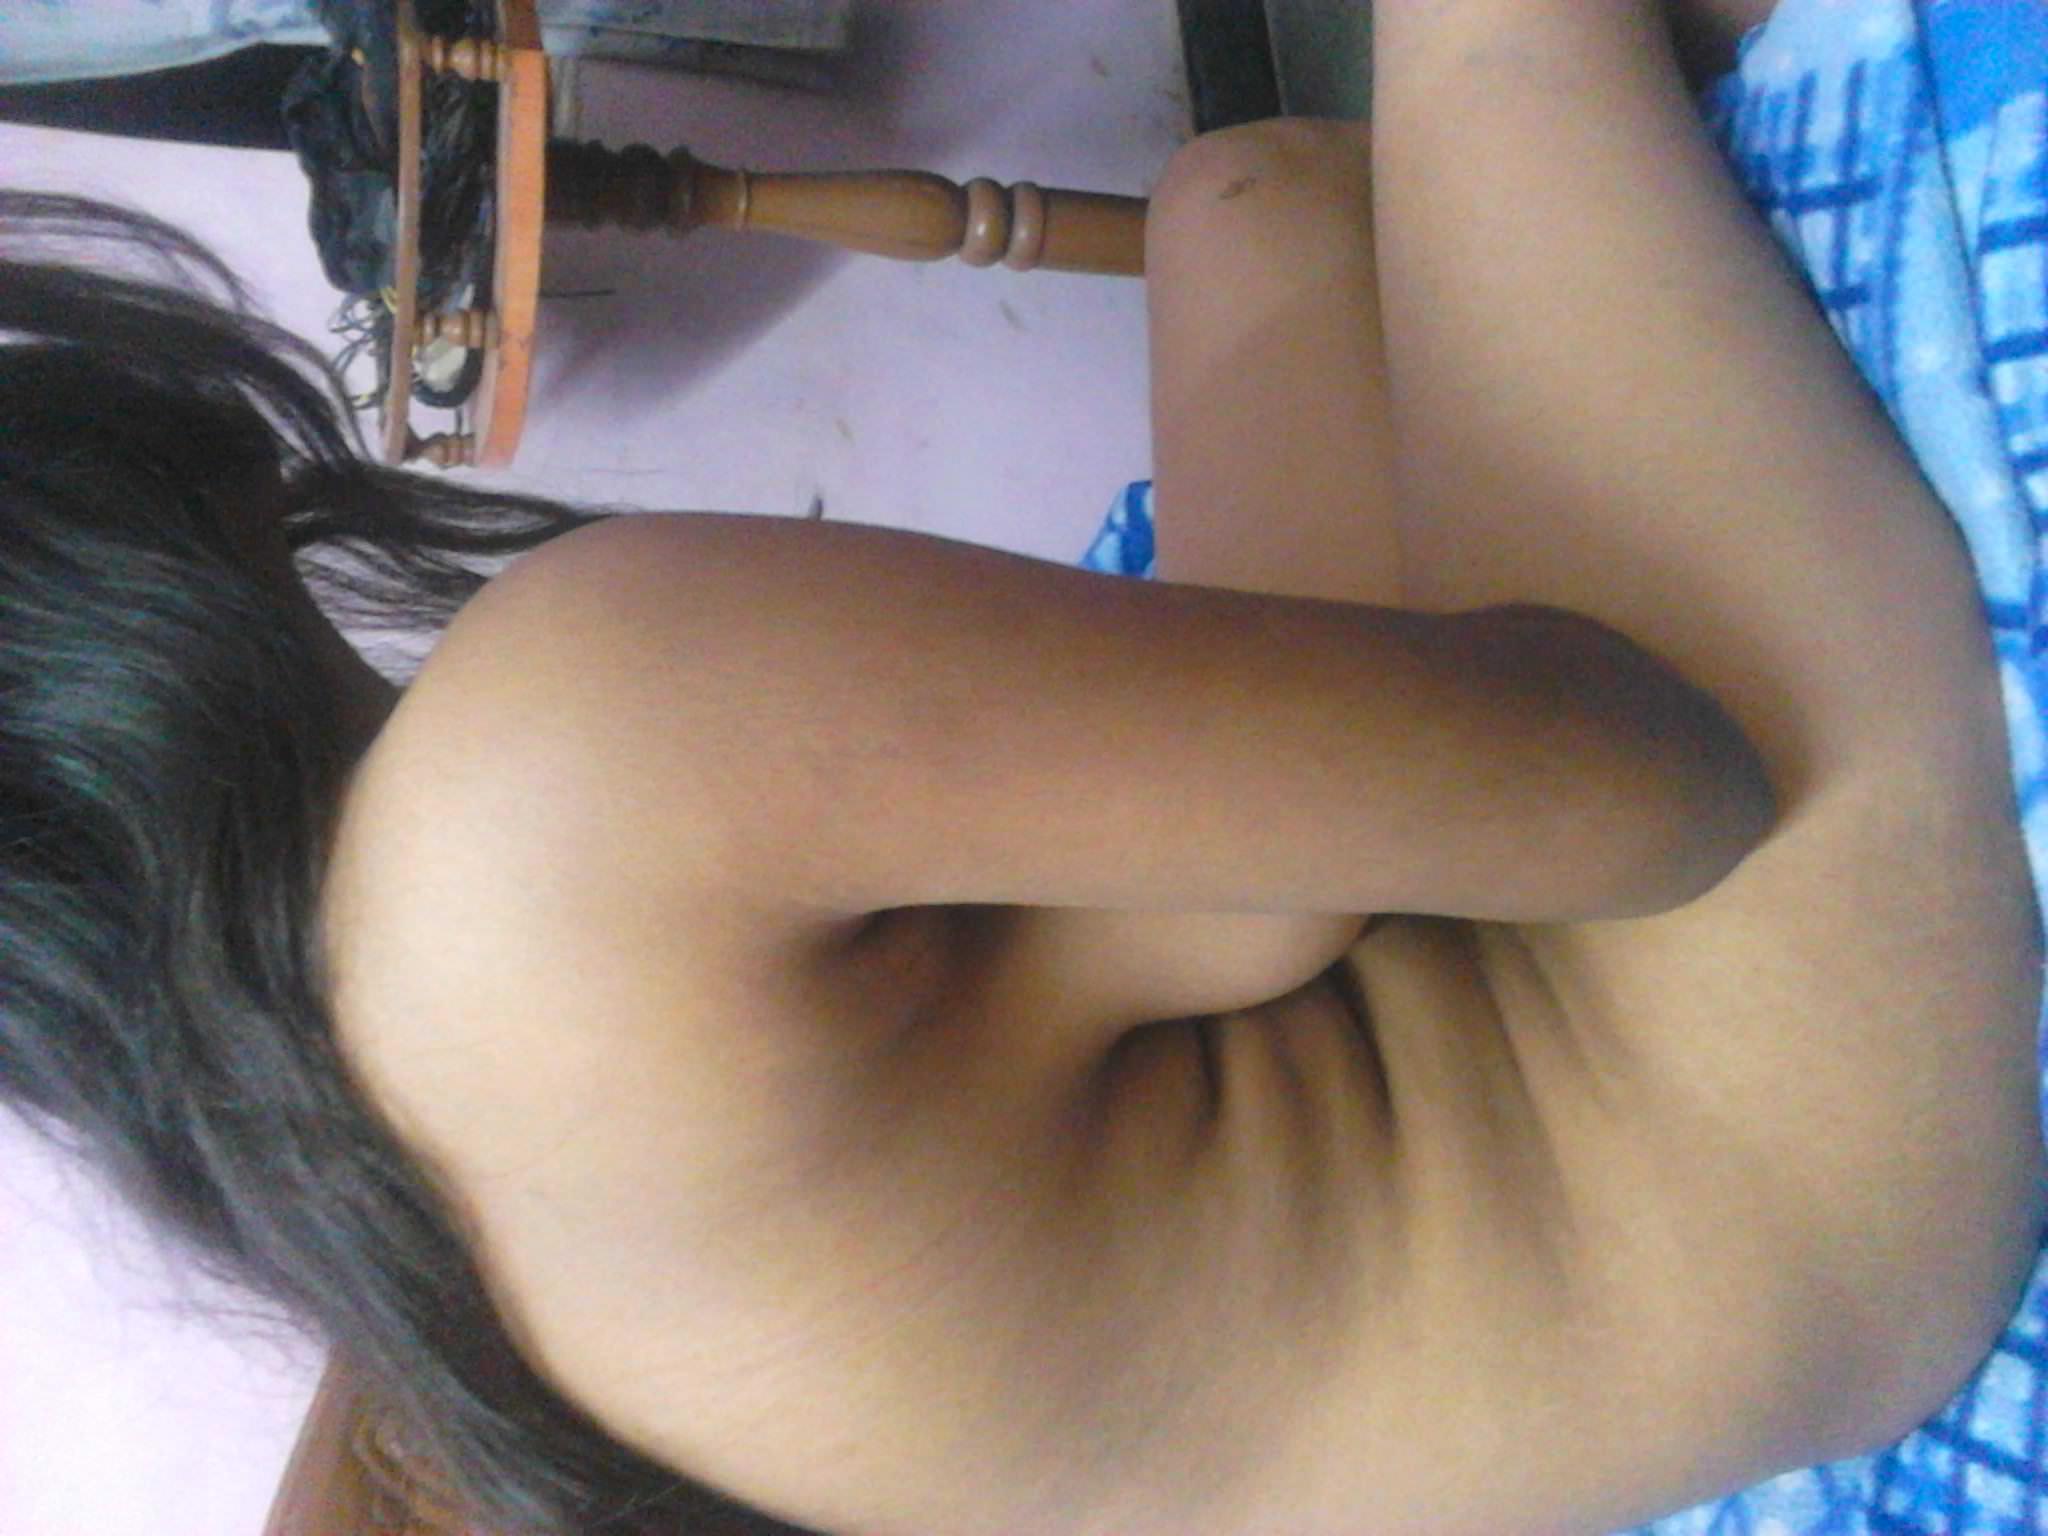 naked midget star wars